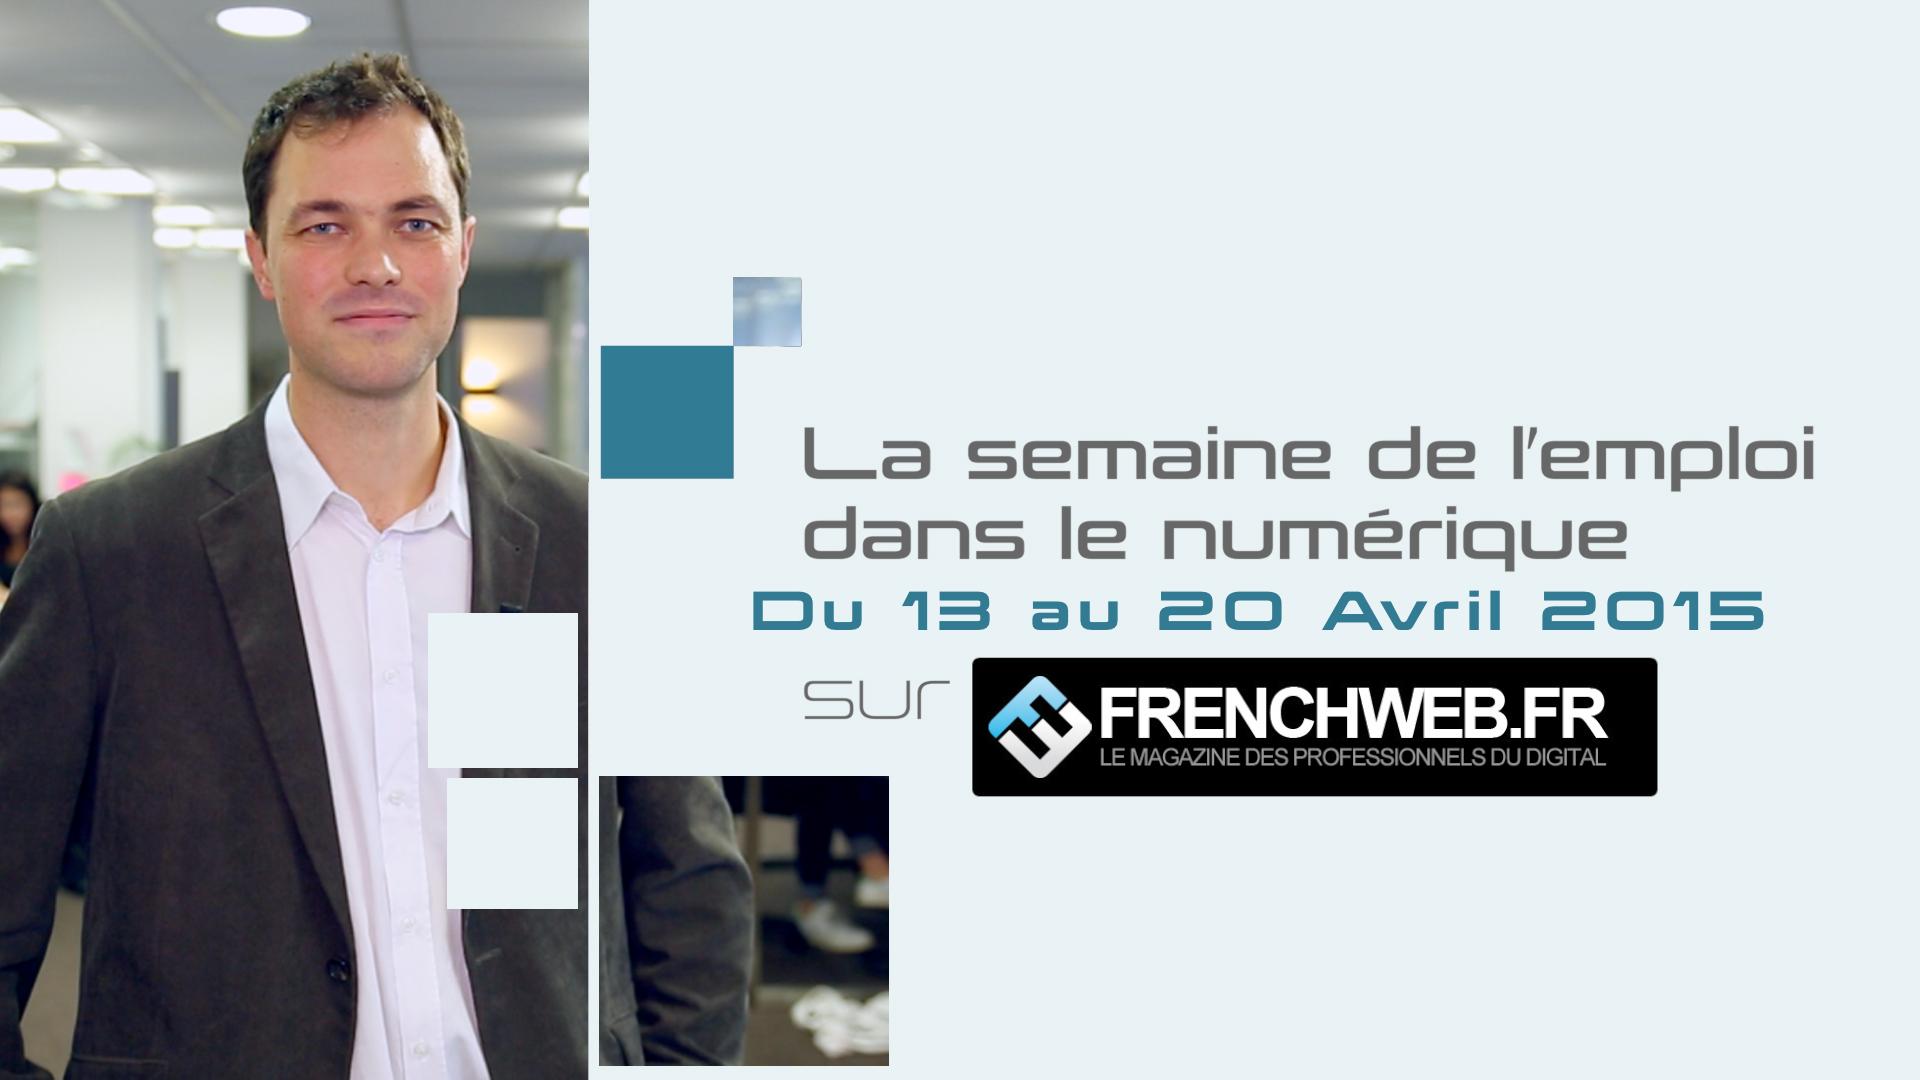 SEN3_Frenchweb_synthésio